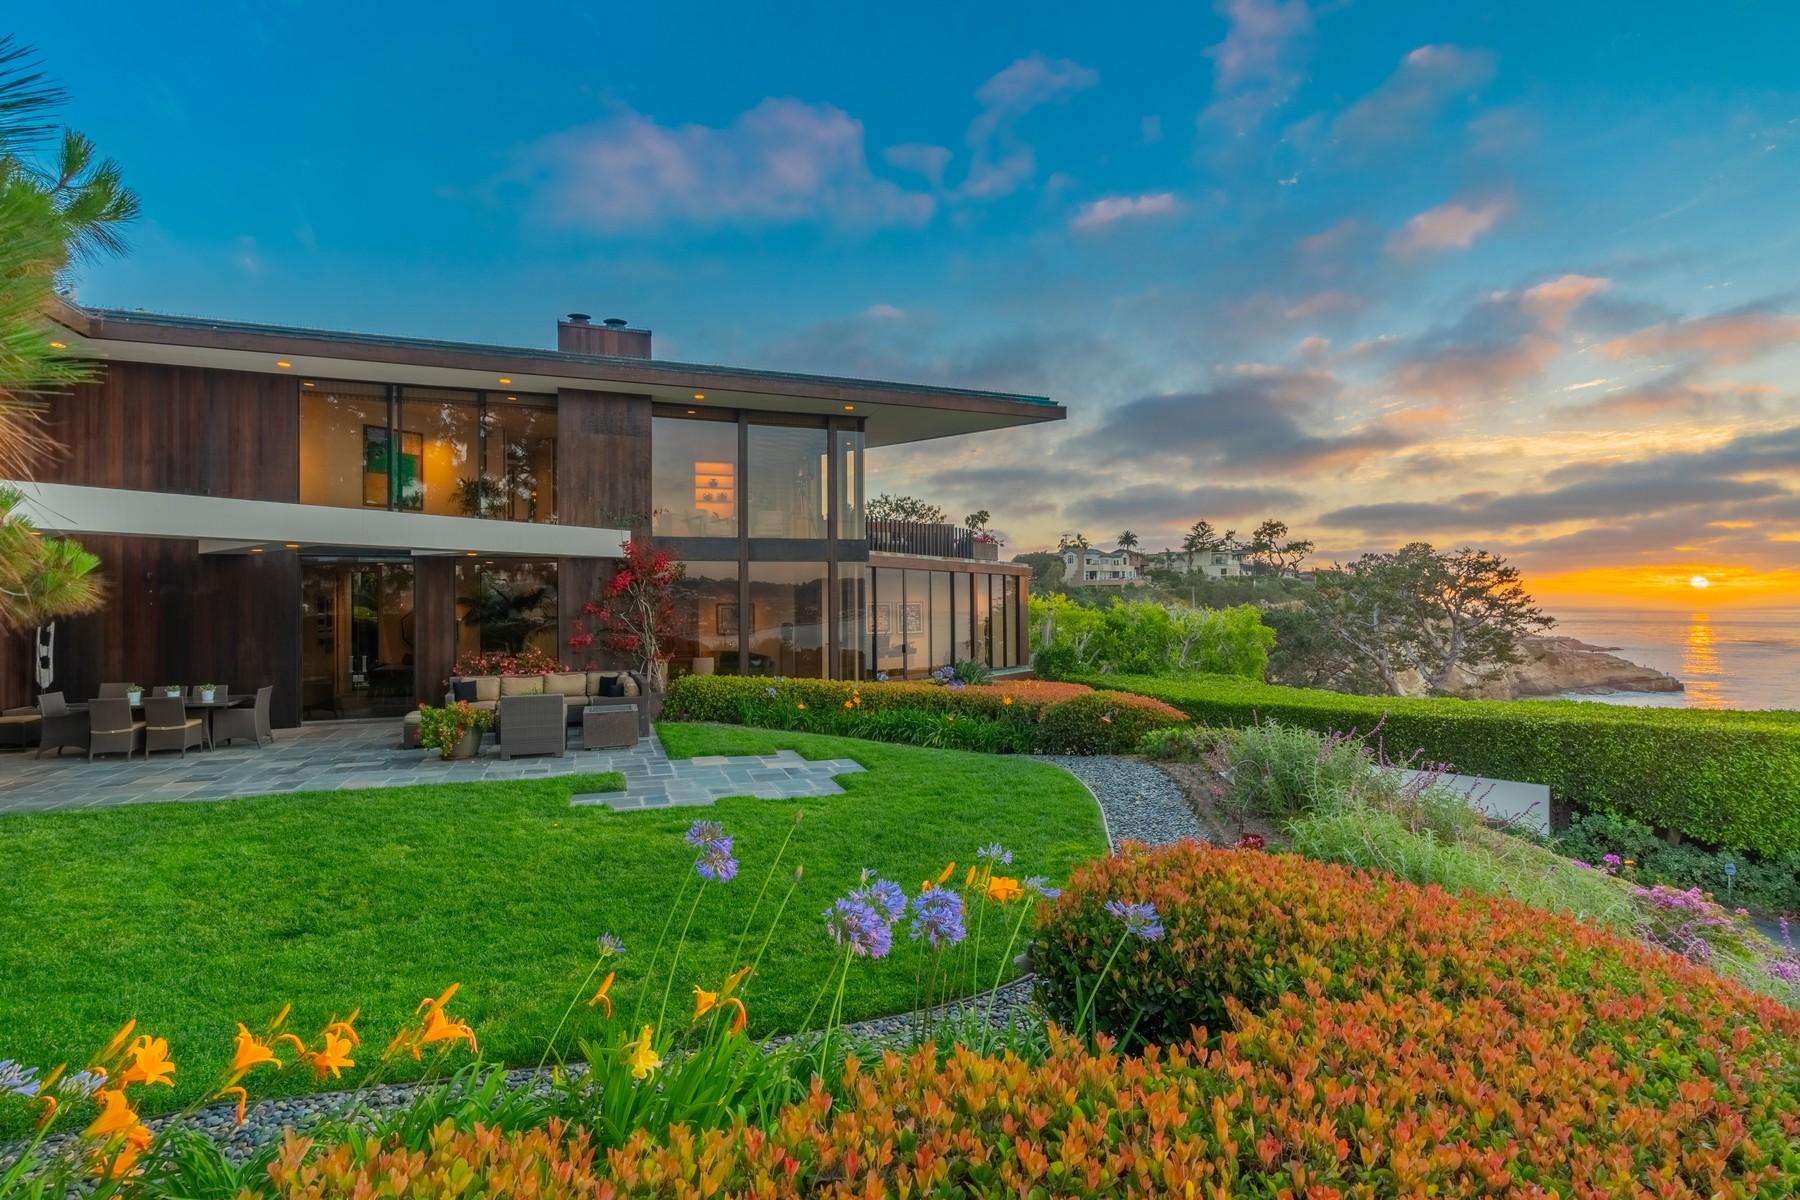 Single Family Home for Active at 1585 Coast Walk La Jolla, California 92037 United States